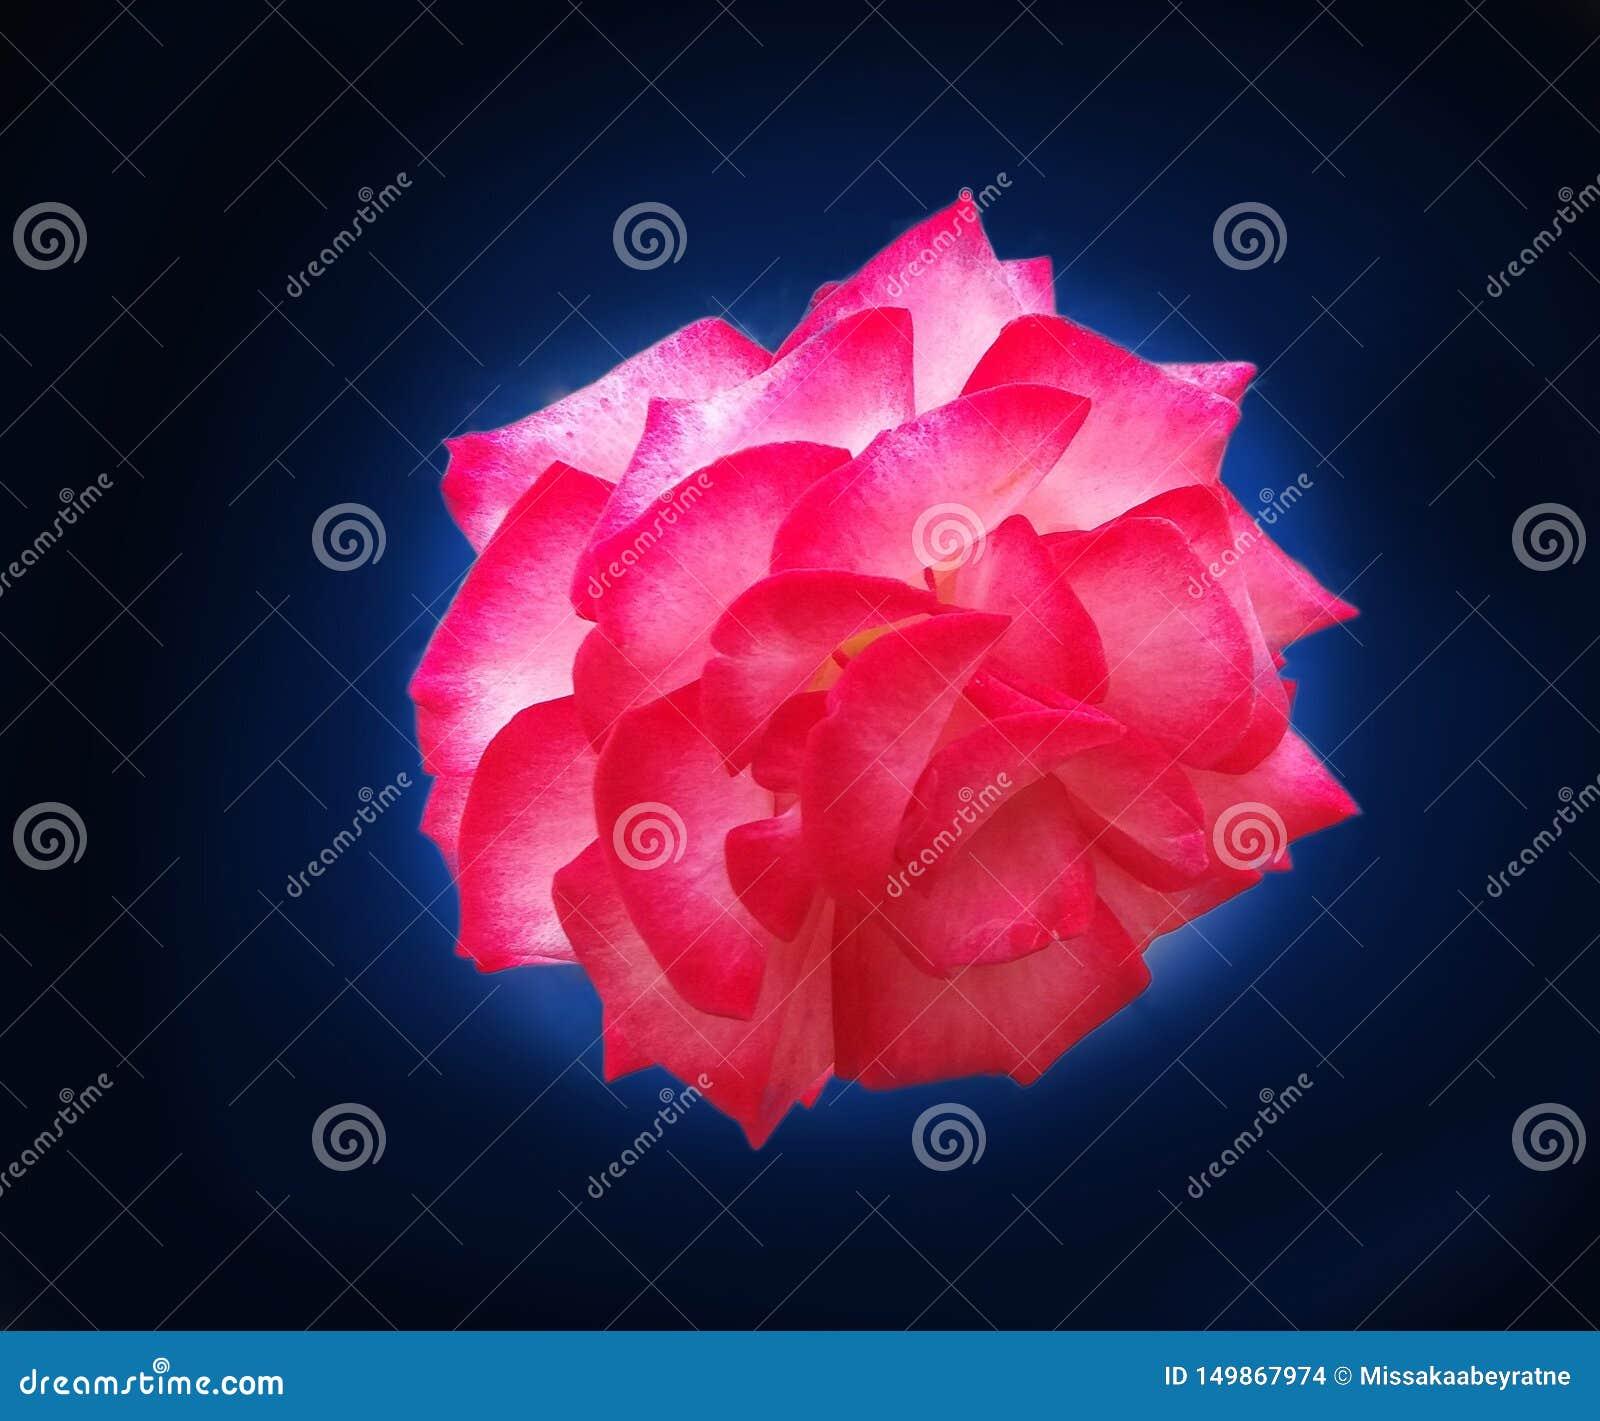 Beautiful Rose Flower in blue & black background